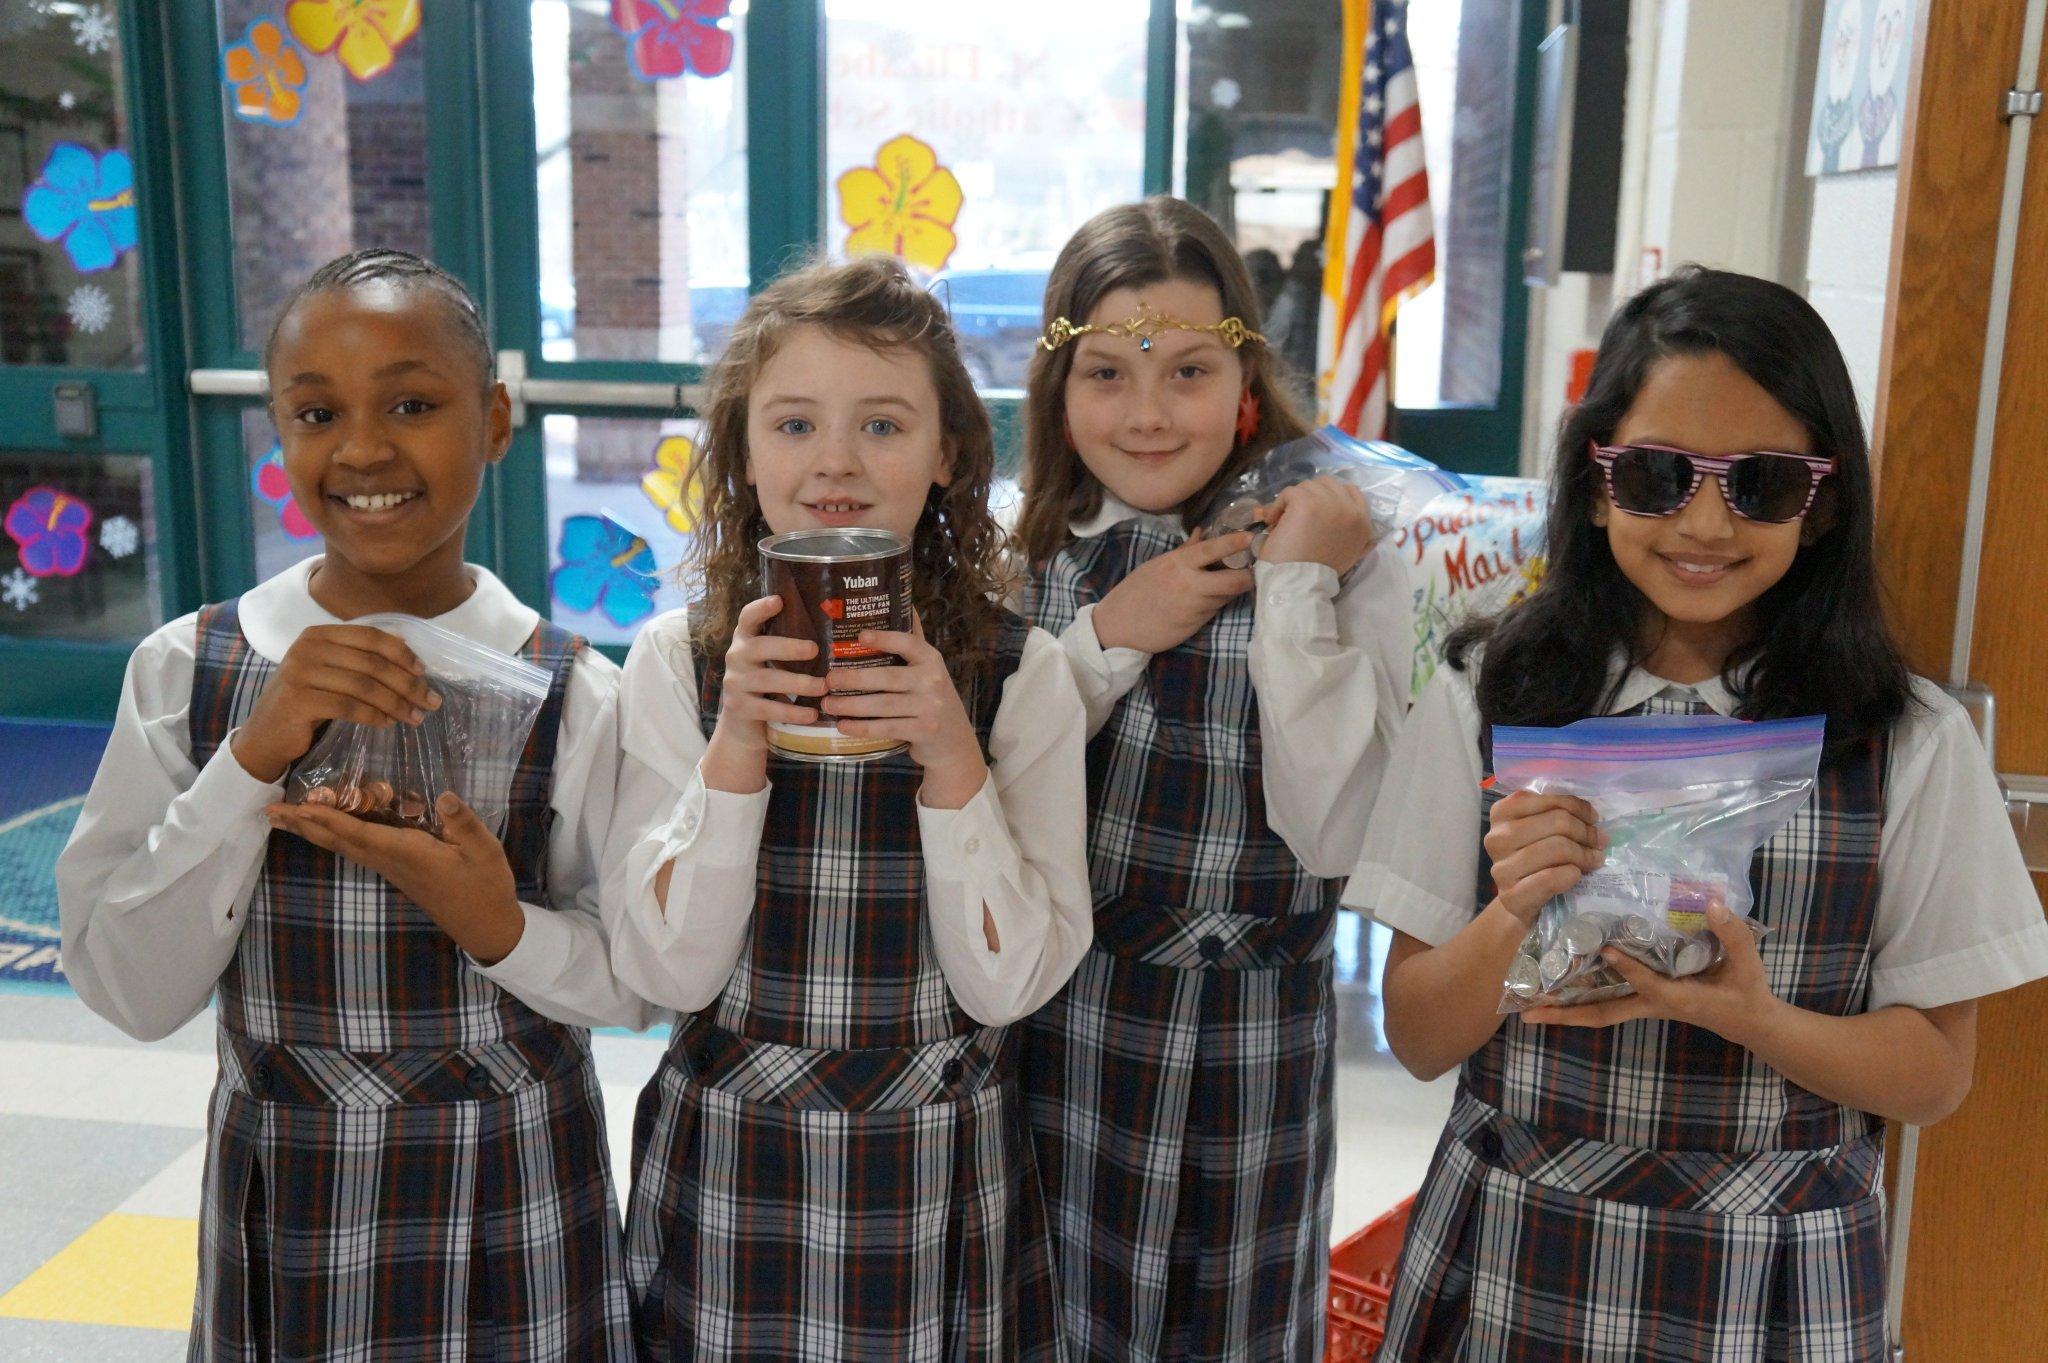 Thumbnail for ADW Catholic Schools Digital Update 2.10